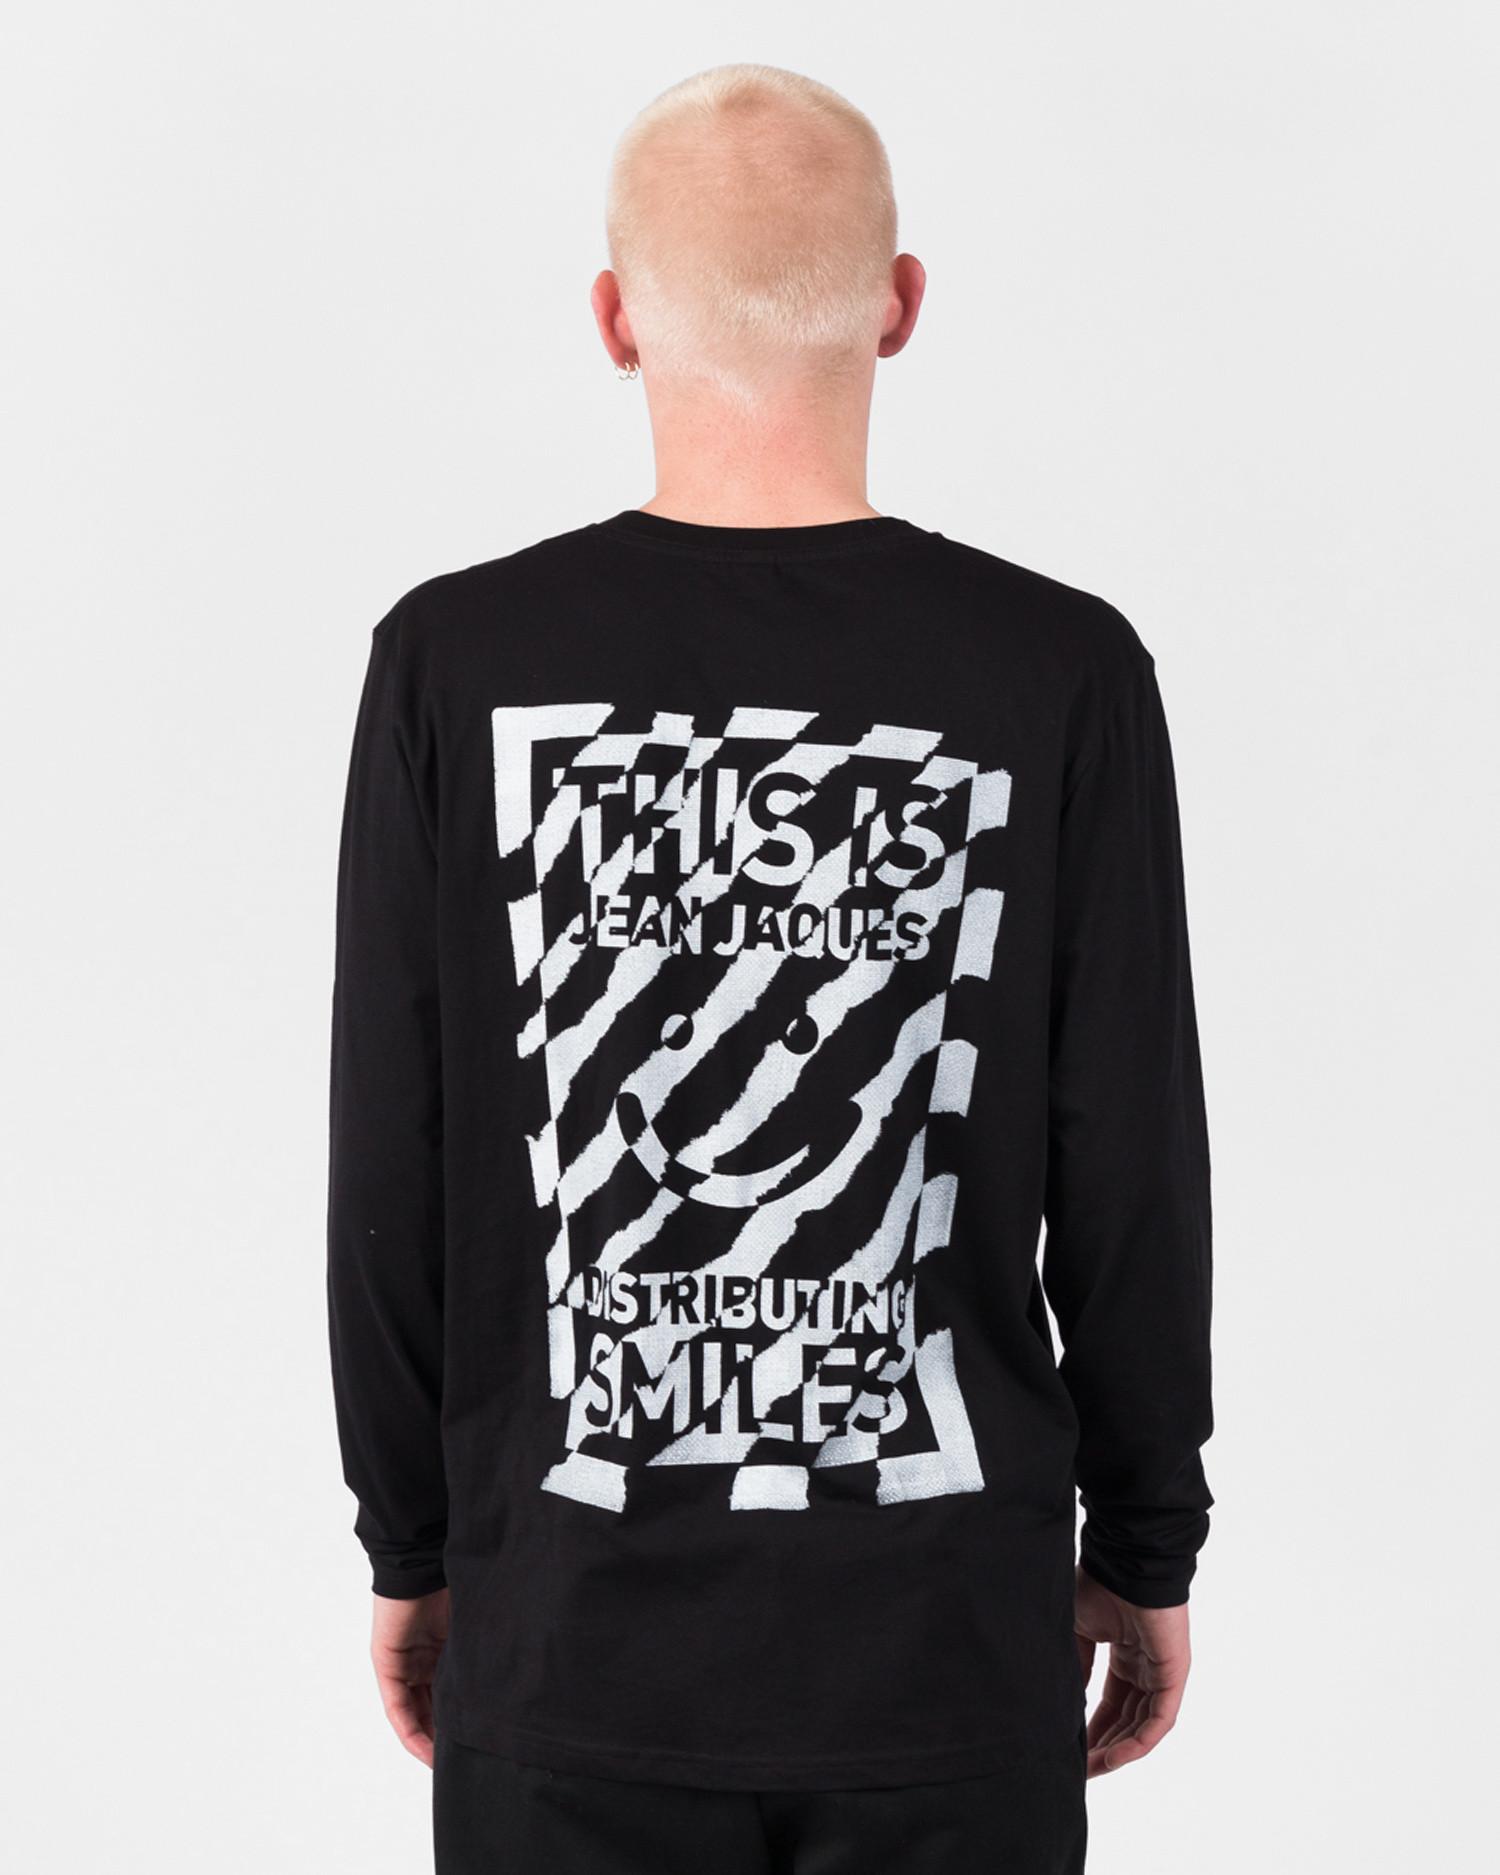 Jean Jaques Zebra Longsleeve Black/White